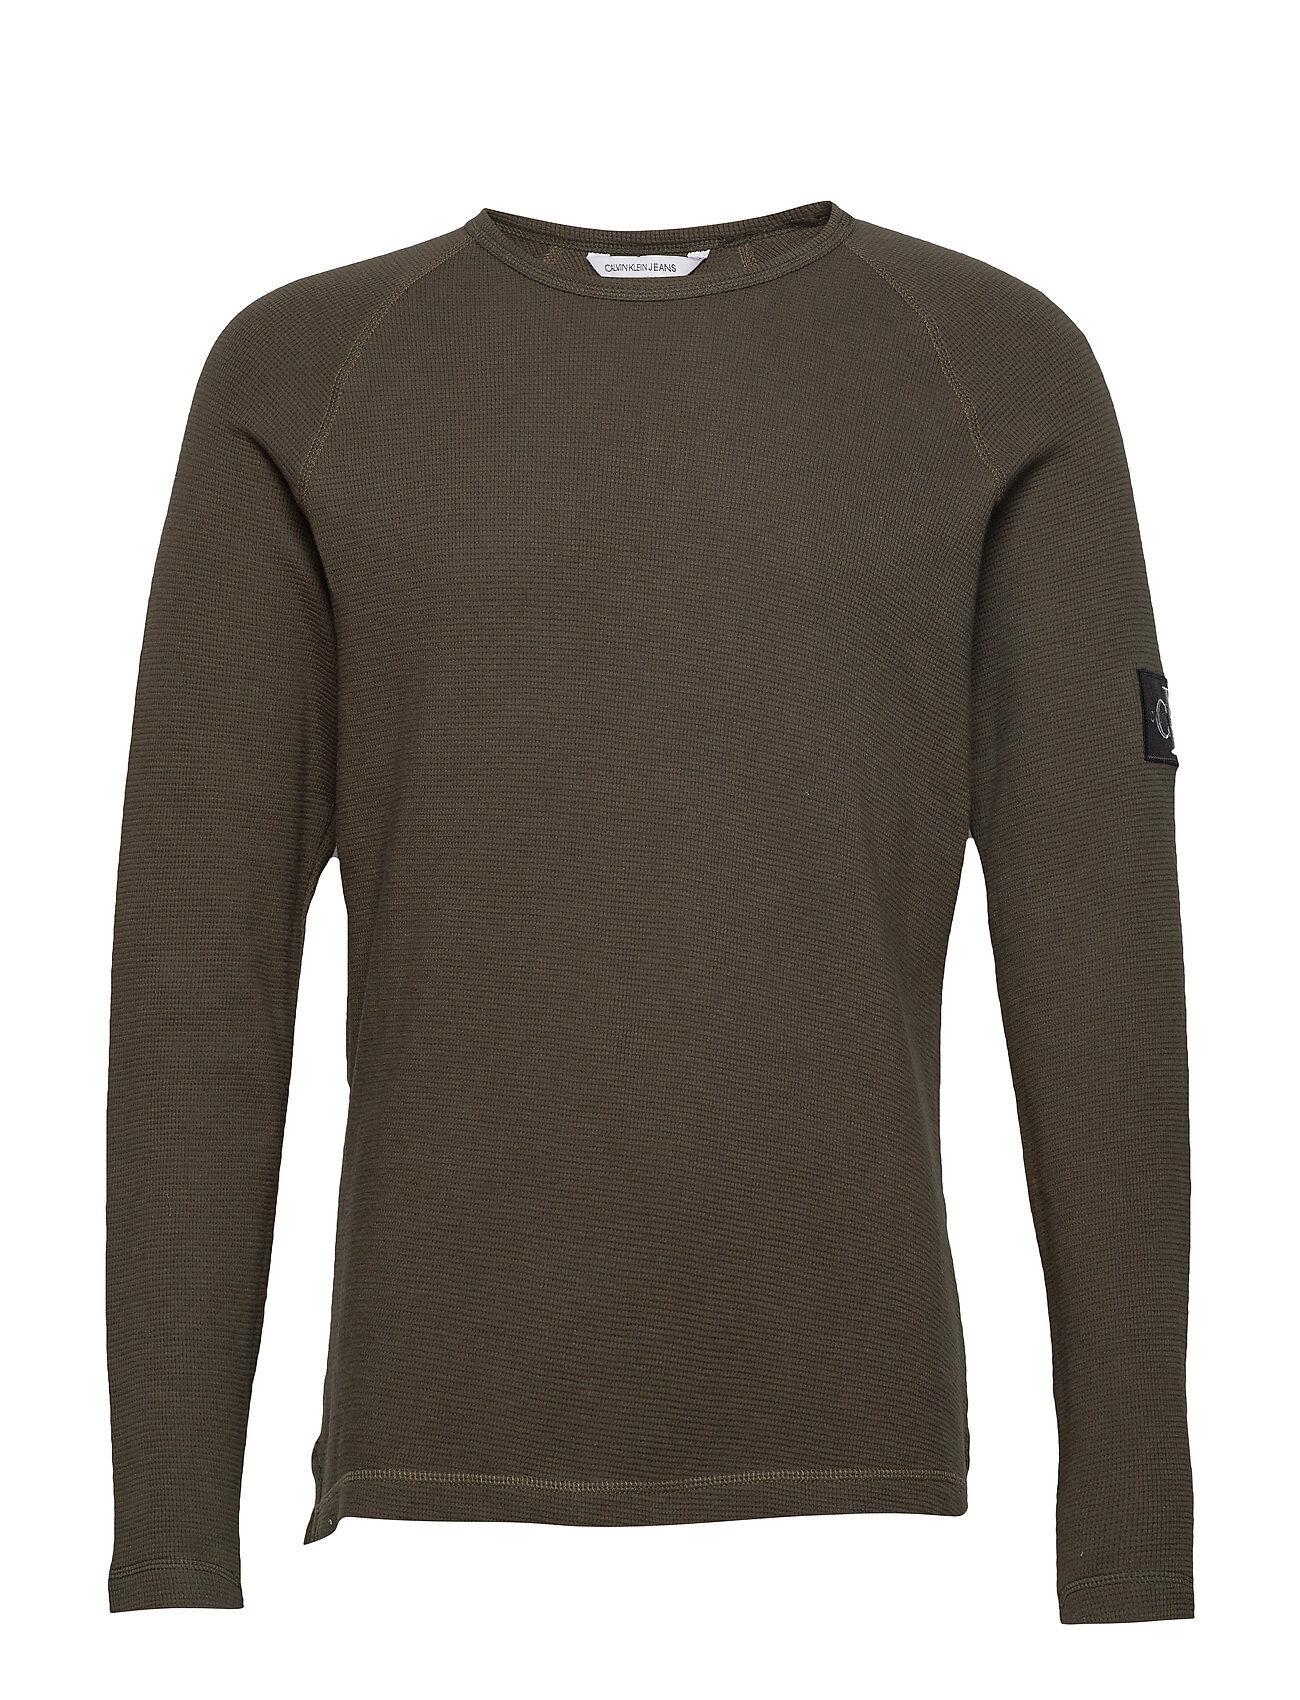 Image of Calvin Waffle Monogram Sleeve Slim L/S T-shirts Long-sleeved Vihreä Calvin Klein Jeans